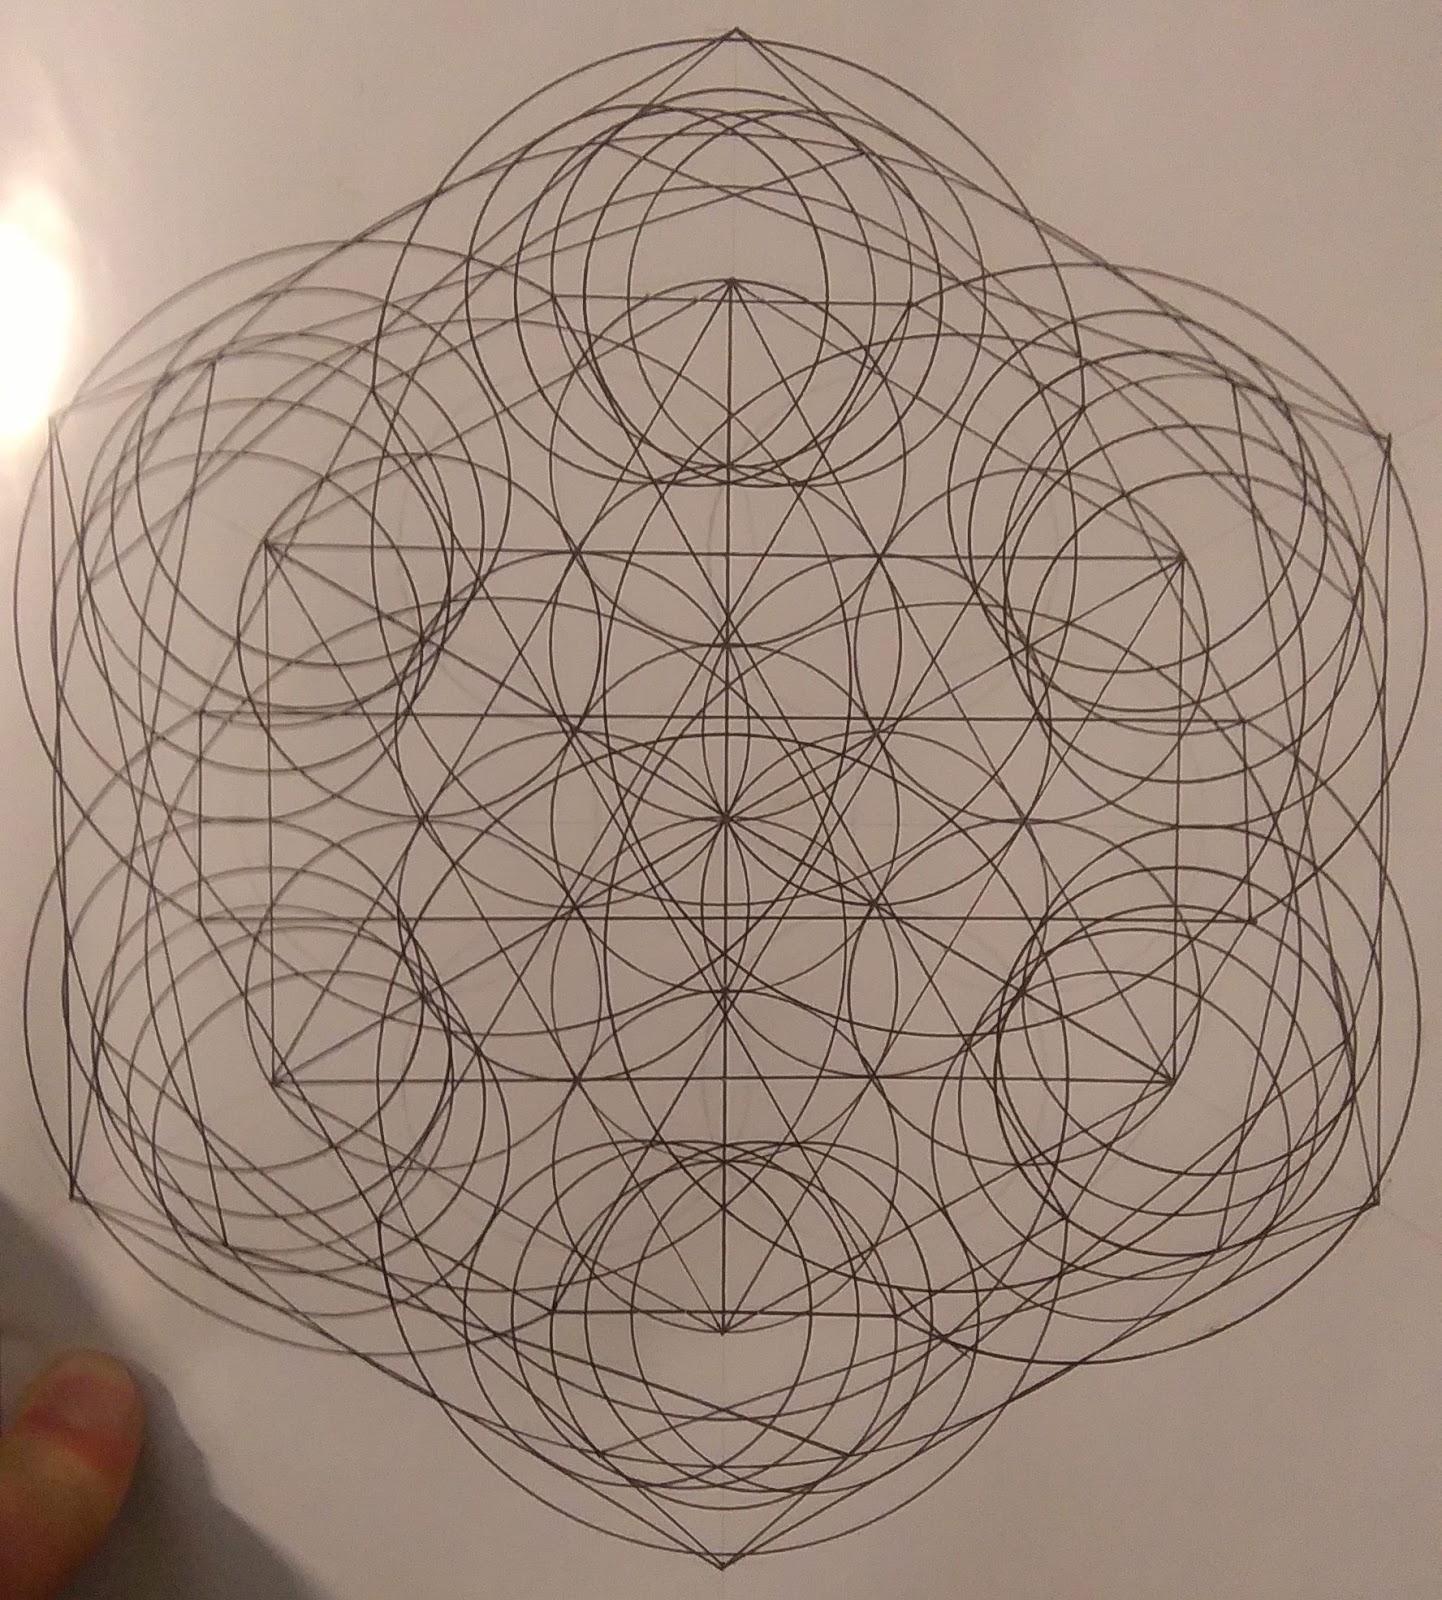 [SPOLYK] - Geometries & sketches - Page 6 48411102_1107573659429317_1420935718804389888_o